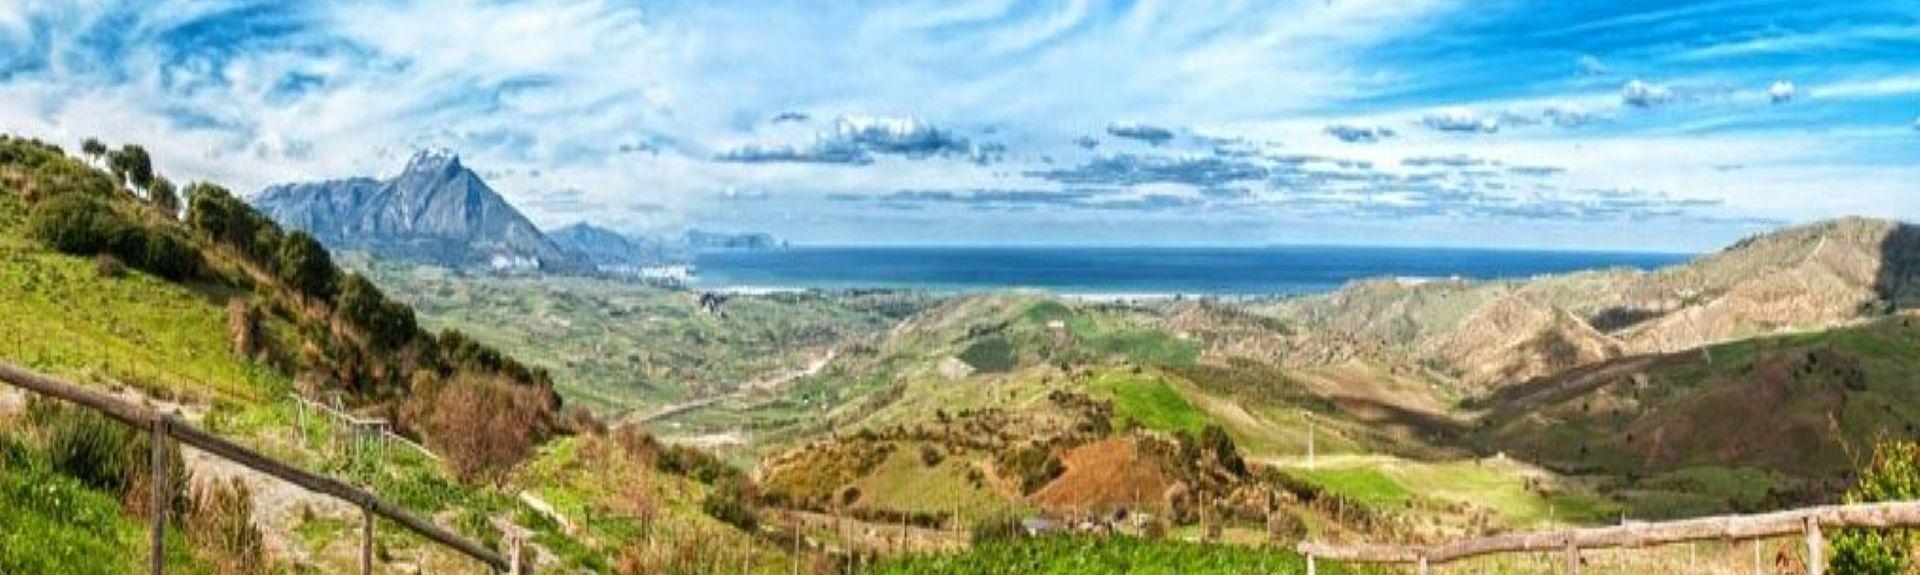 Caltavuturo, Palermo, Sicily, Italy